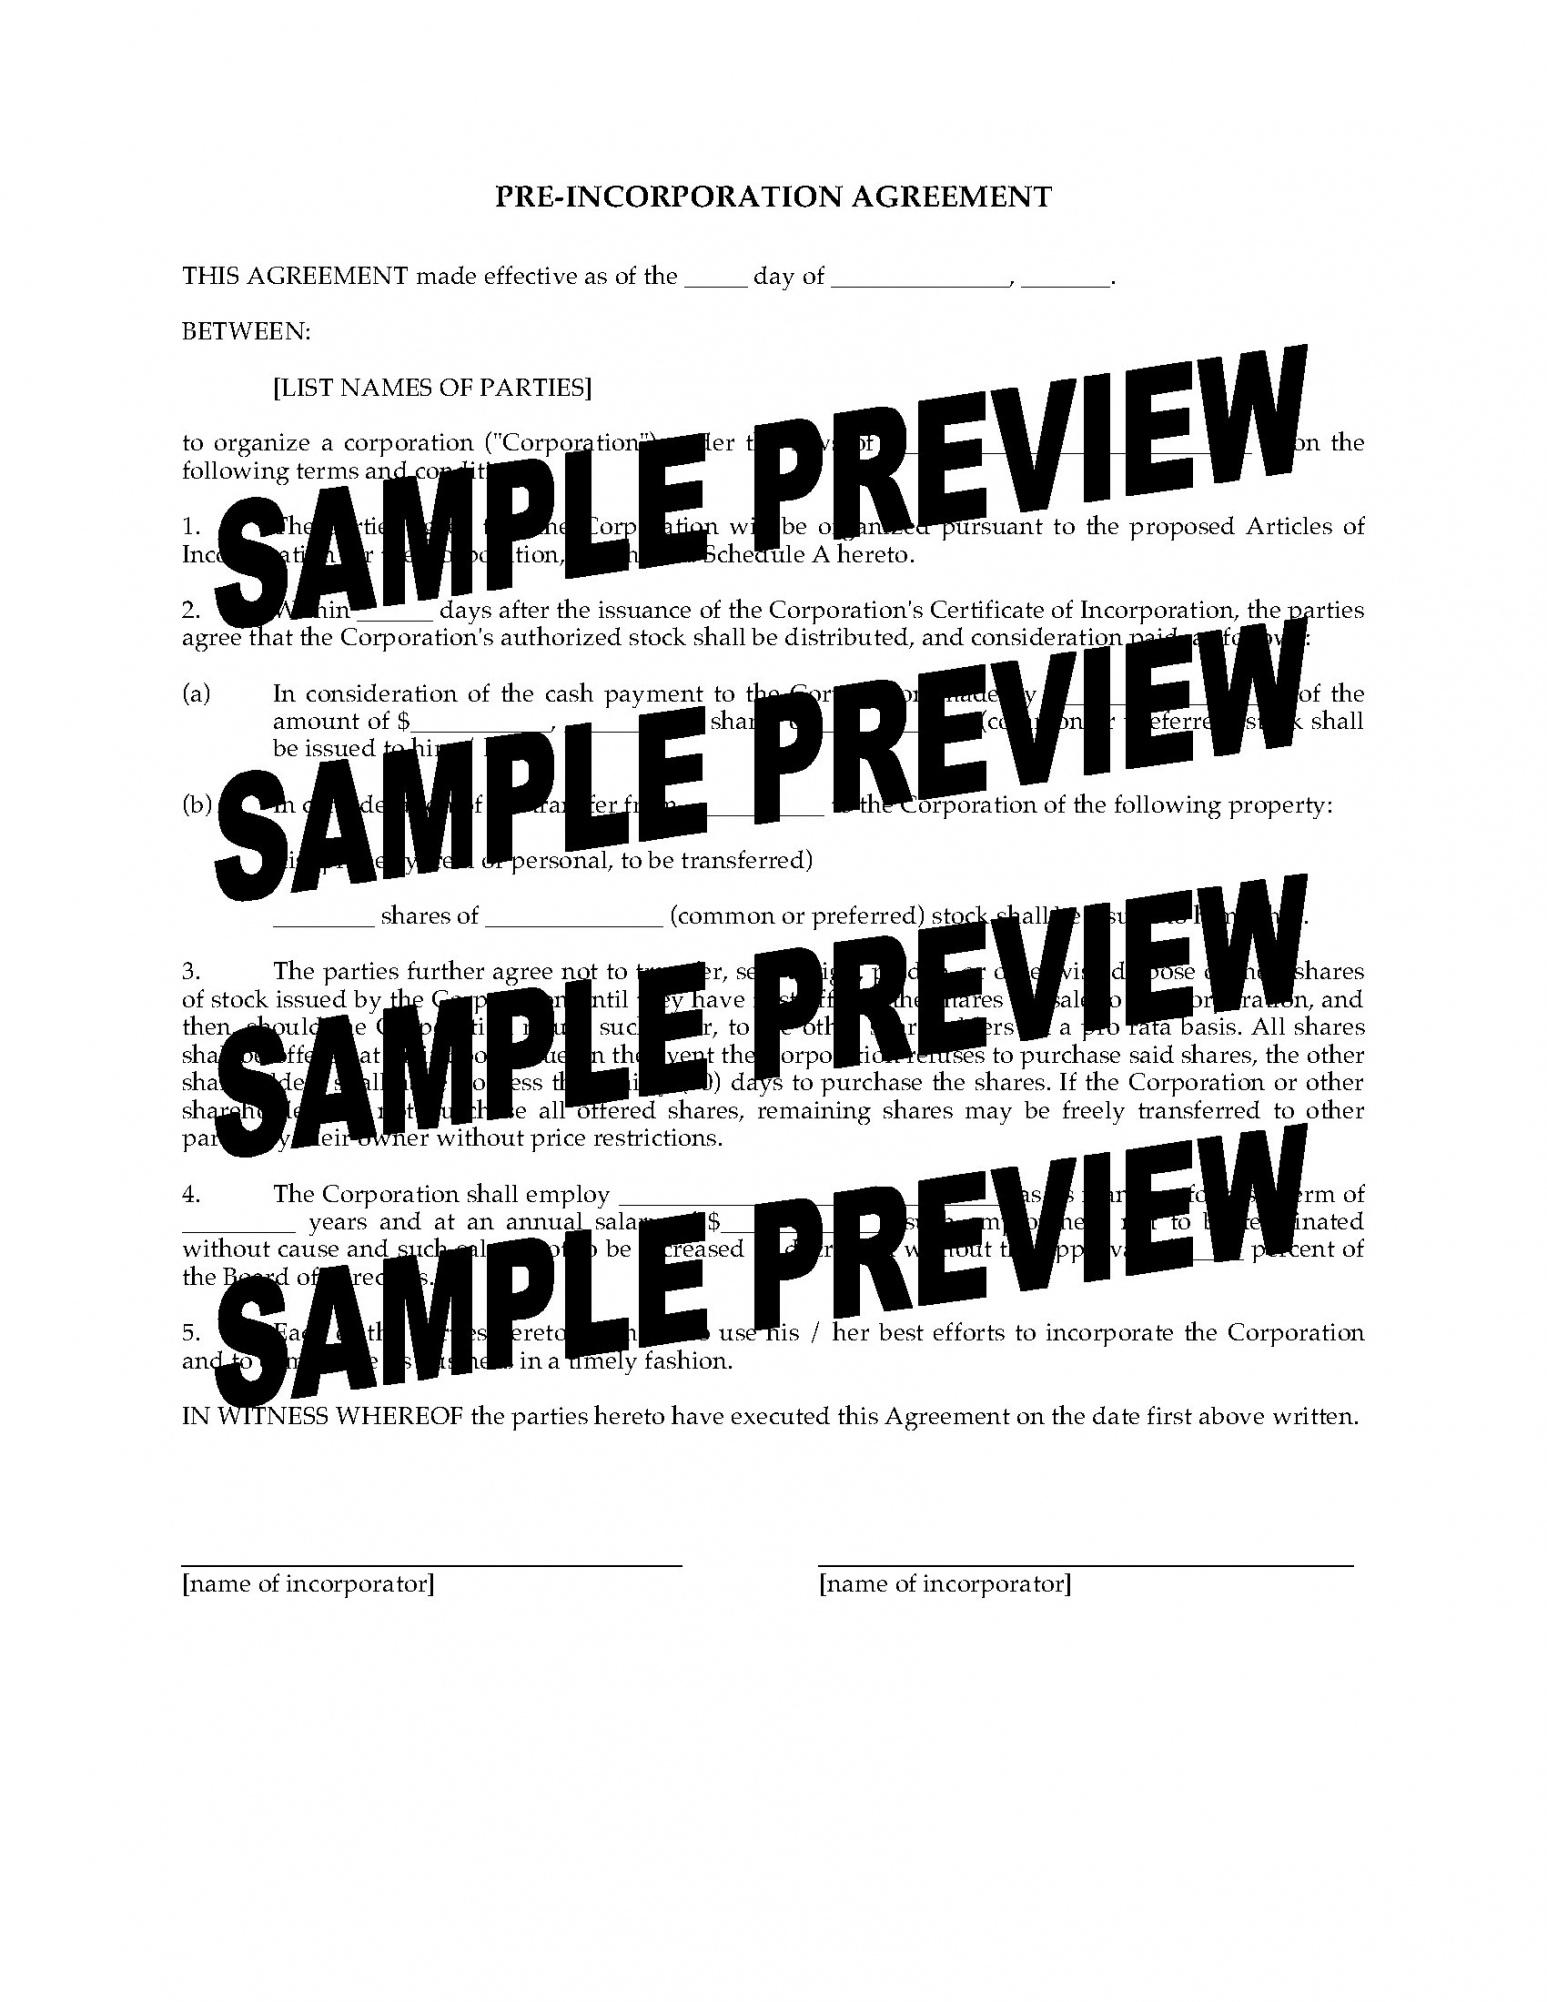 printable preincorporation agreement pre incorporation agreement template